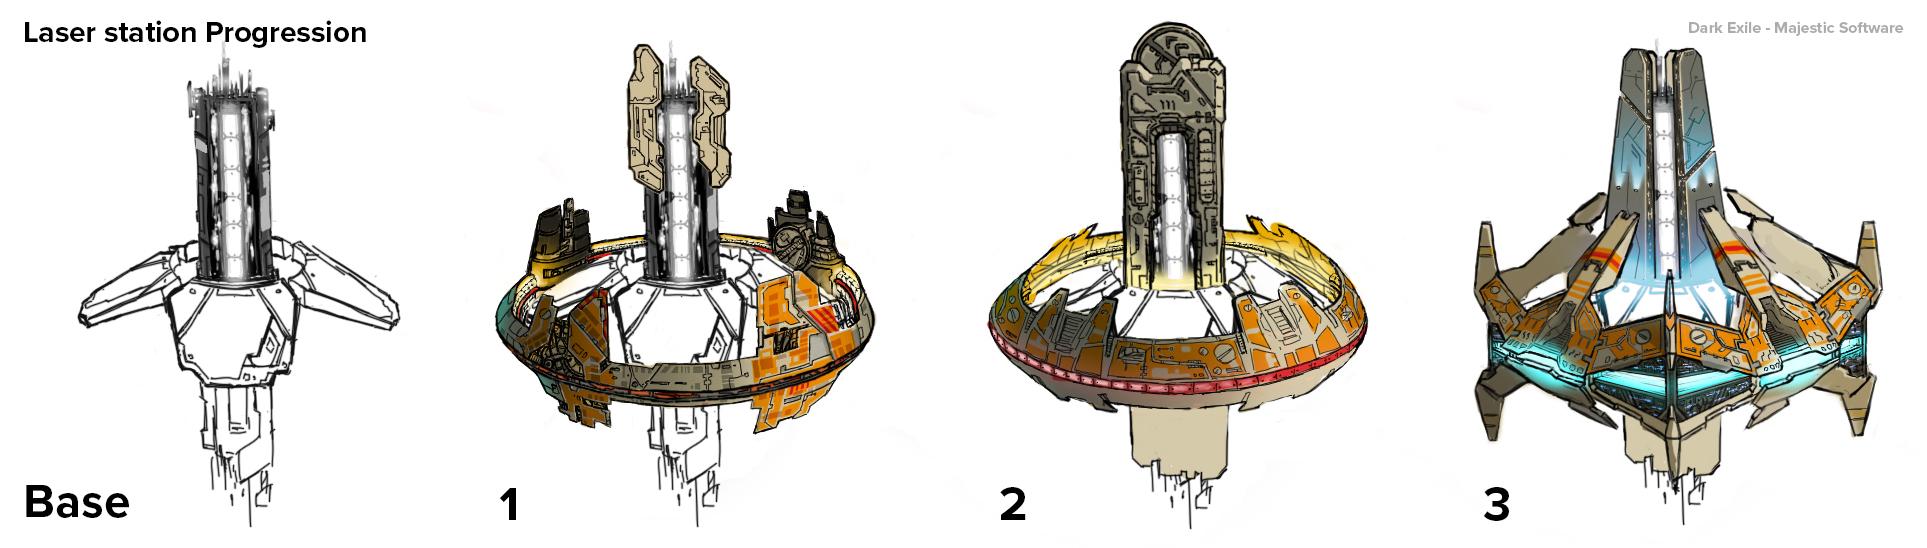 laser stations progression.jpg